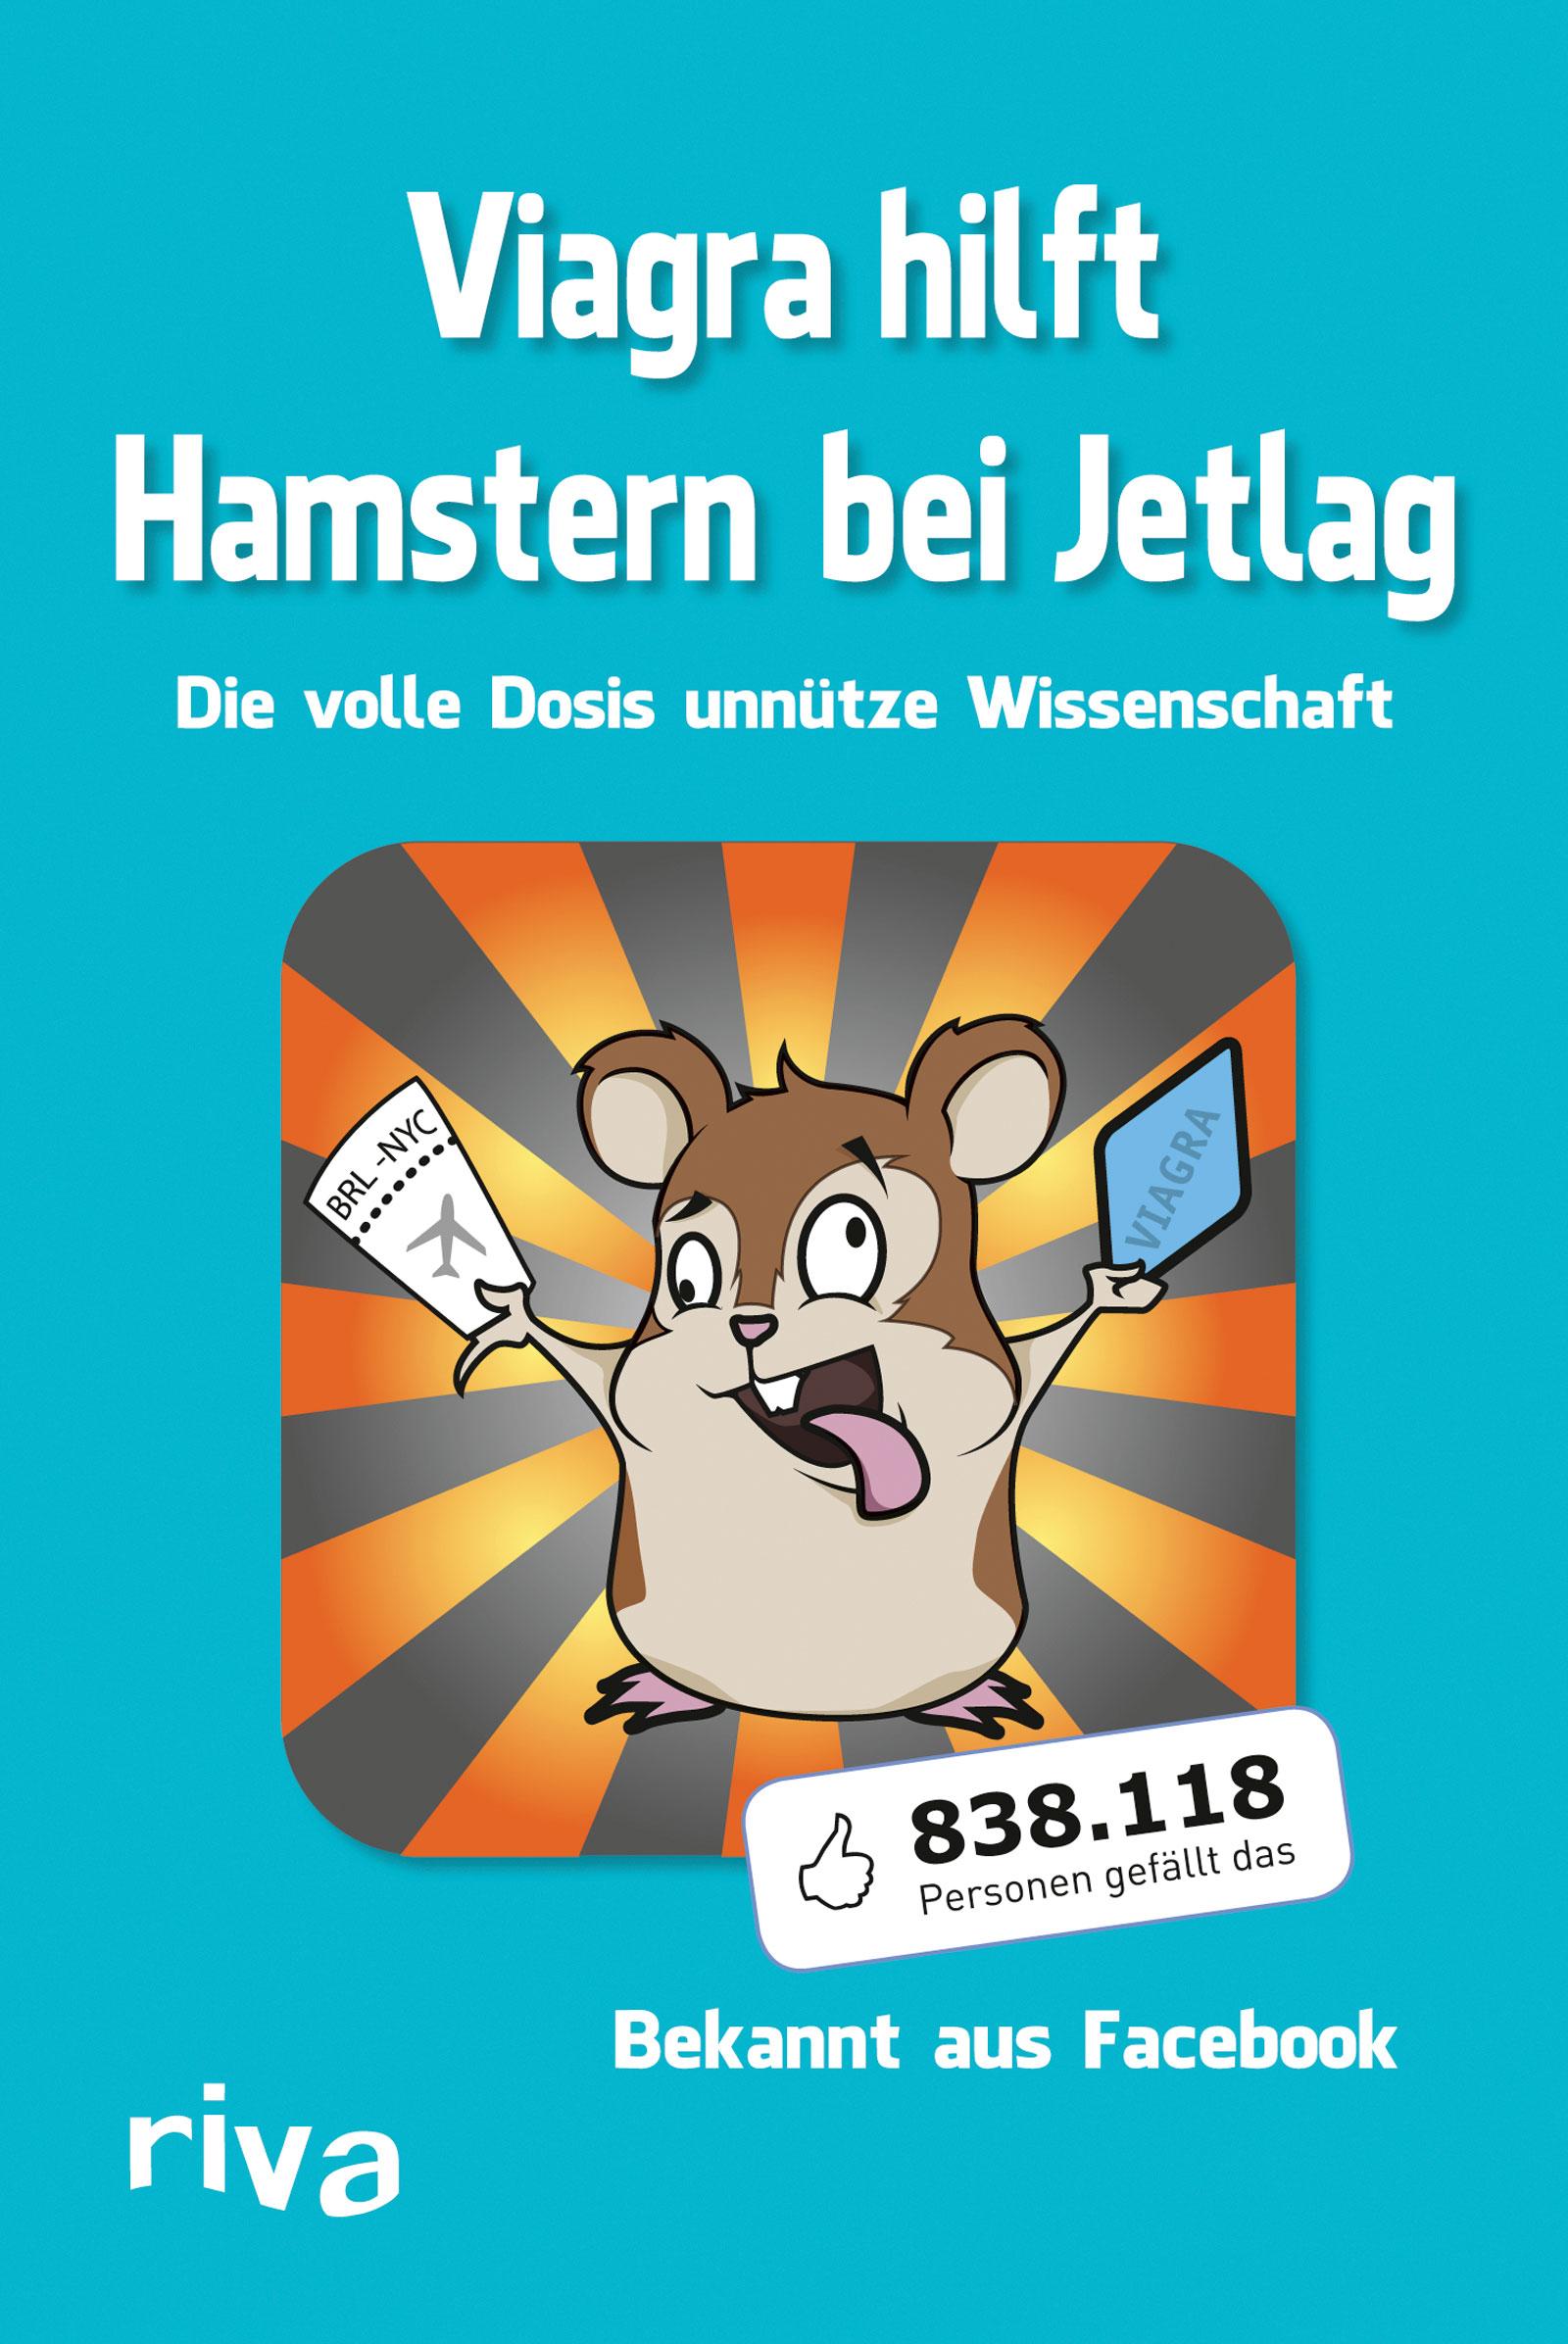 Viagra hilft Hamstern bei Jetlag: Die volle Dos...